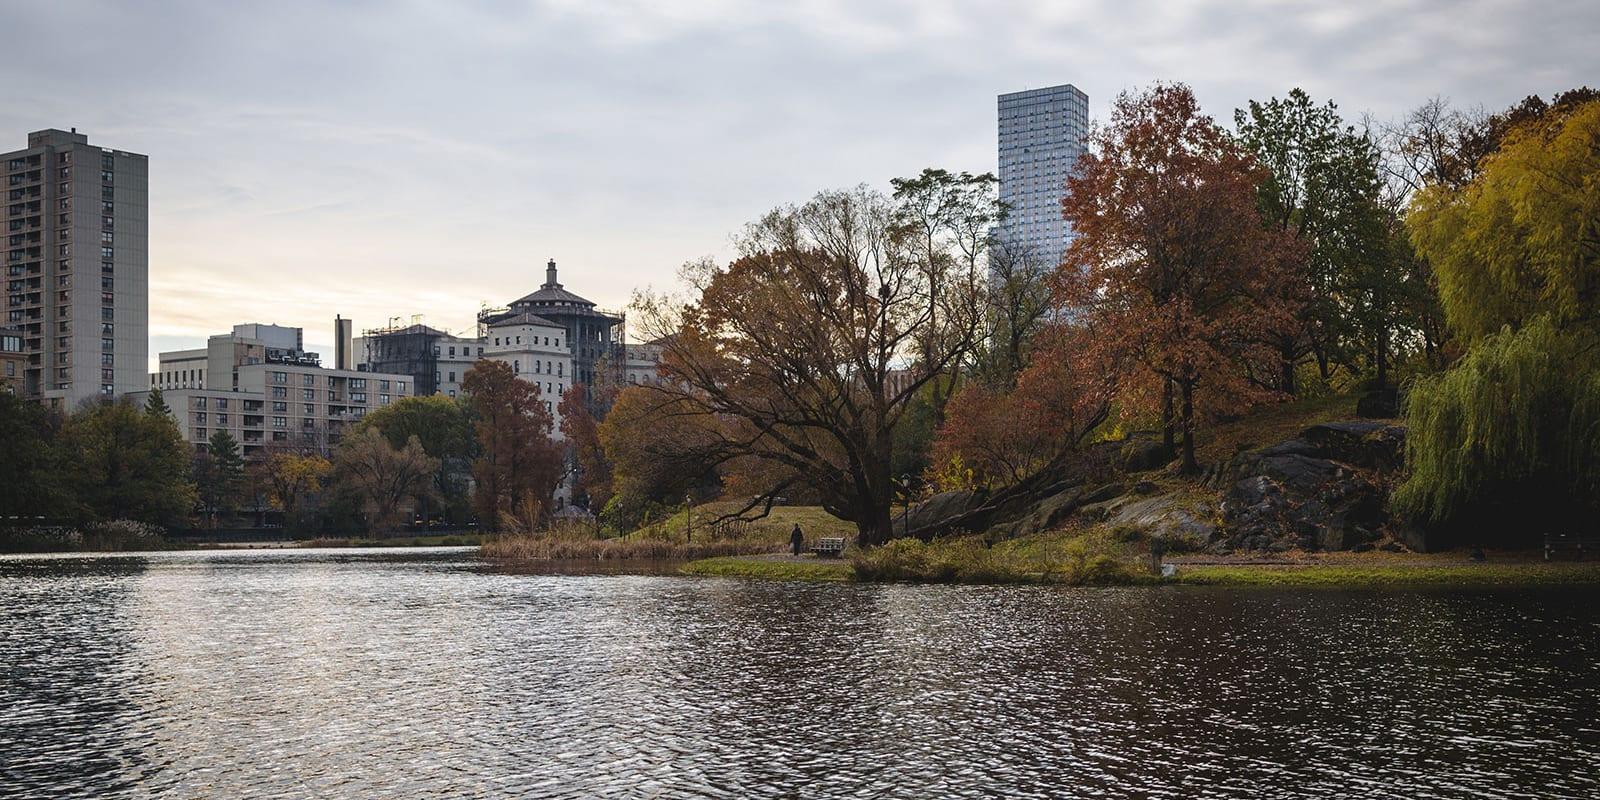 Harlem Meer in Central Park NYC